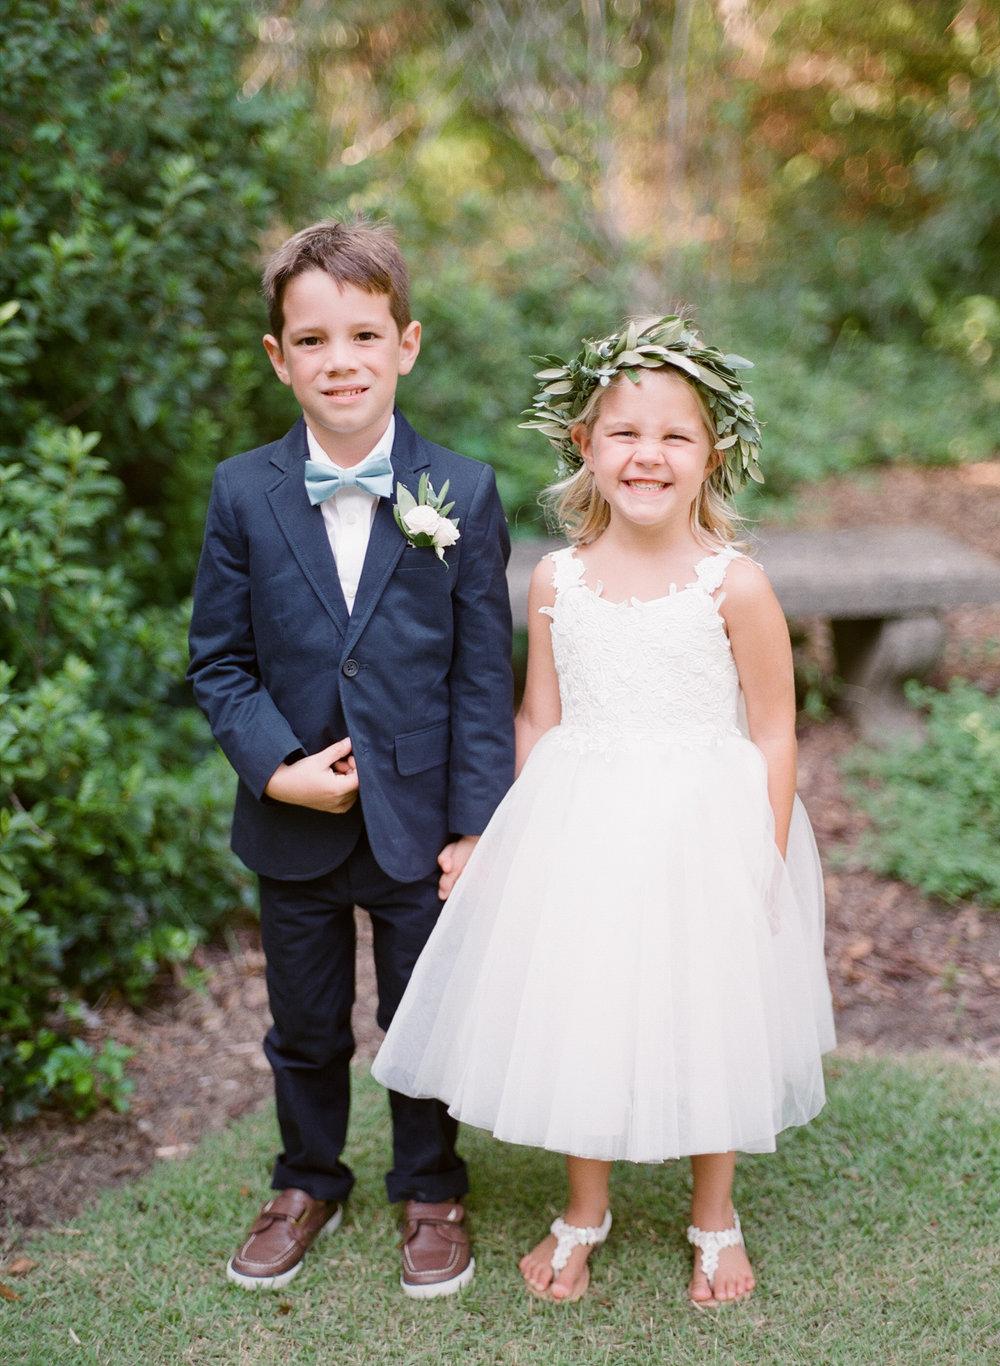 Airlie-Gardens-Wedding-35.jpg